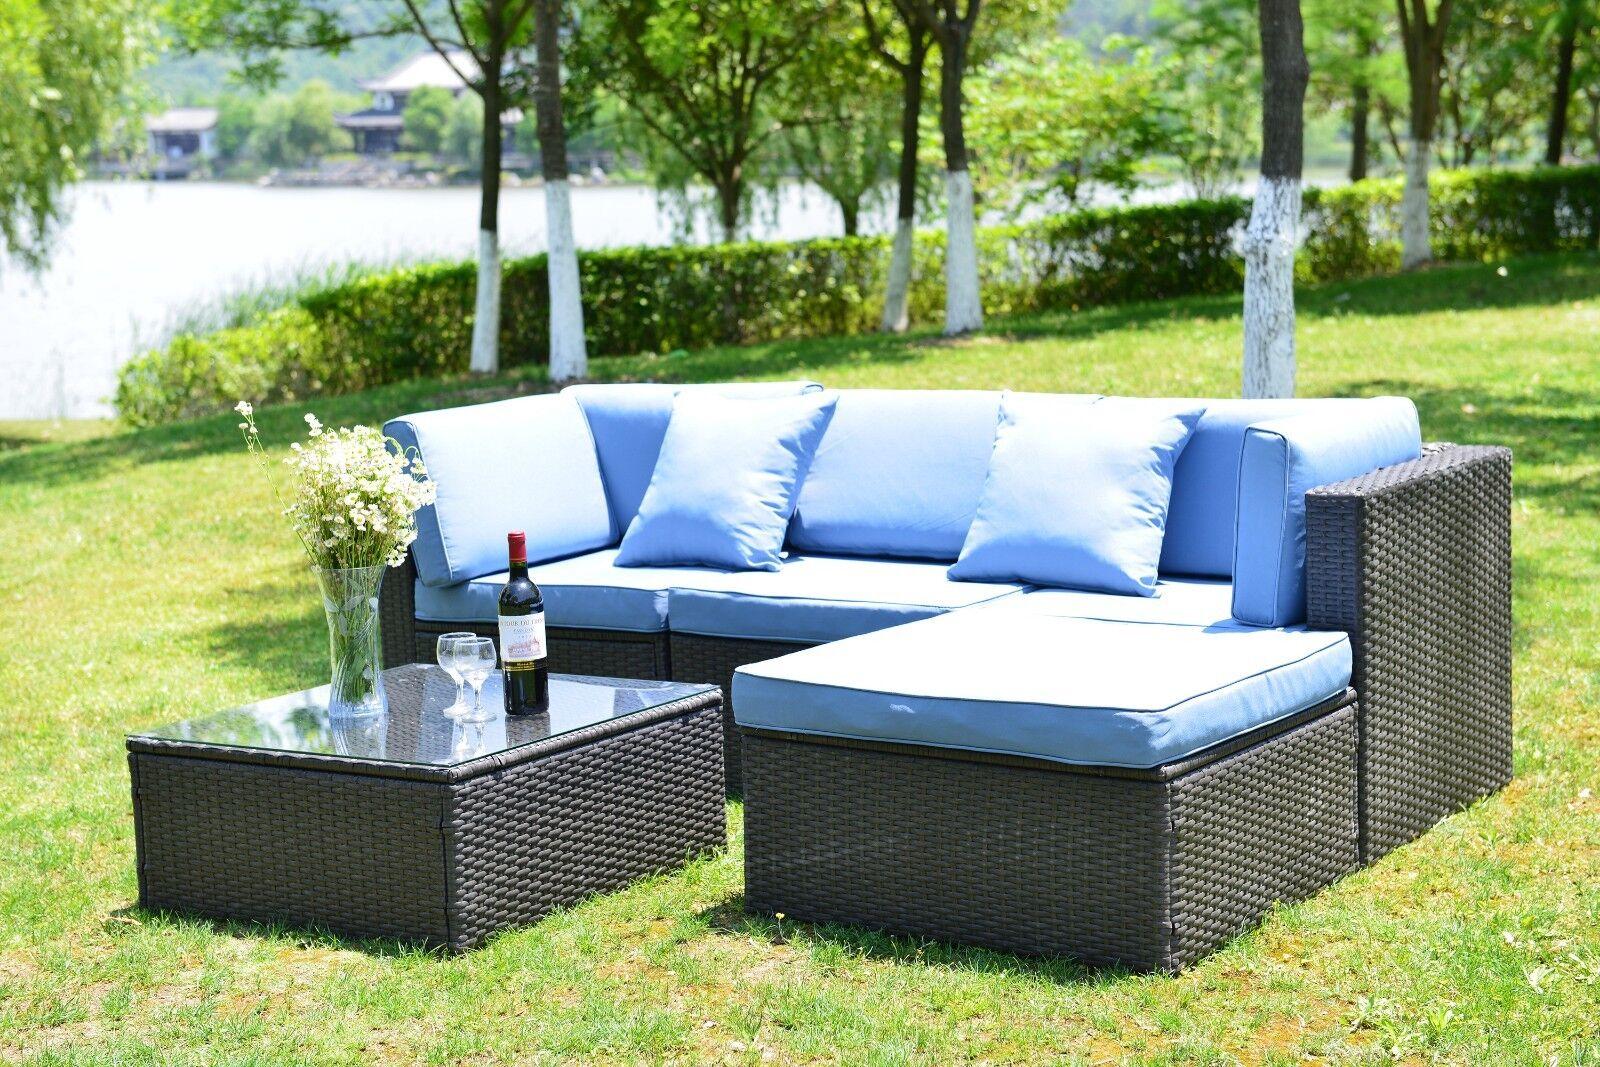 5 PCS Patio Furniture Sectional Sofa Set Outdoor Rattan Wick